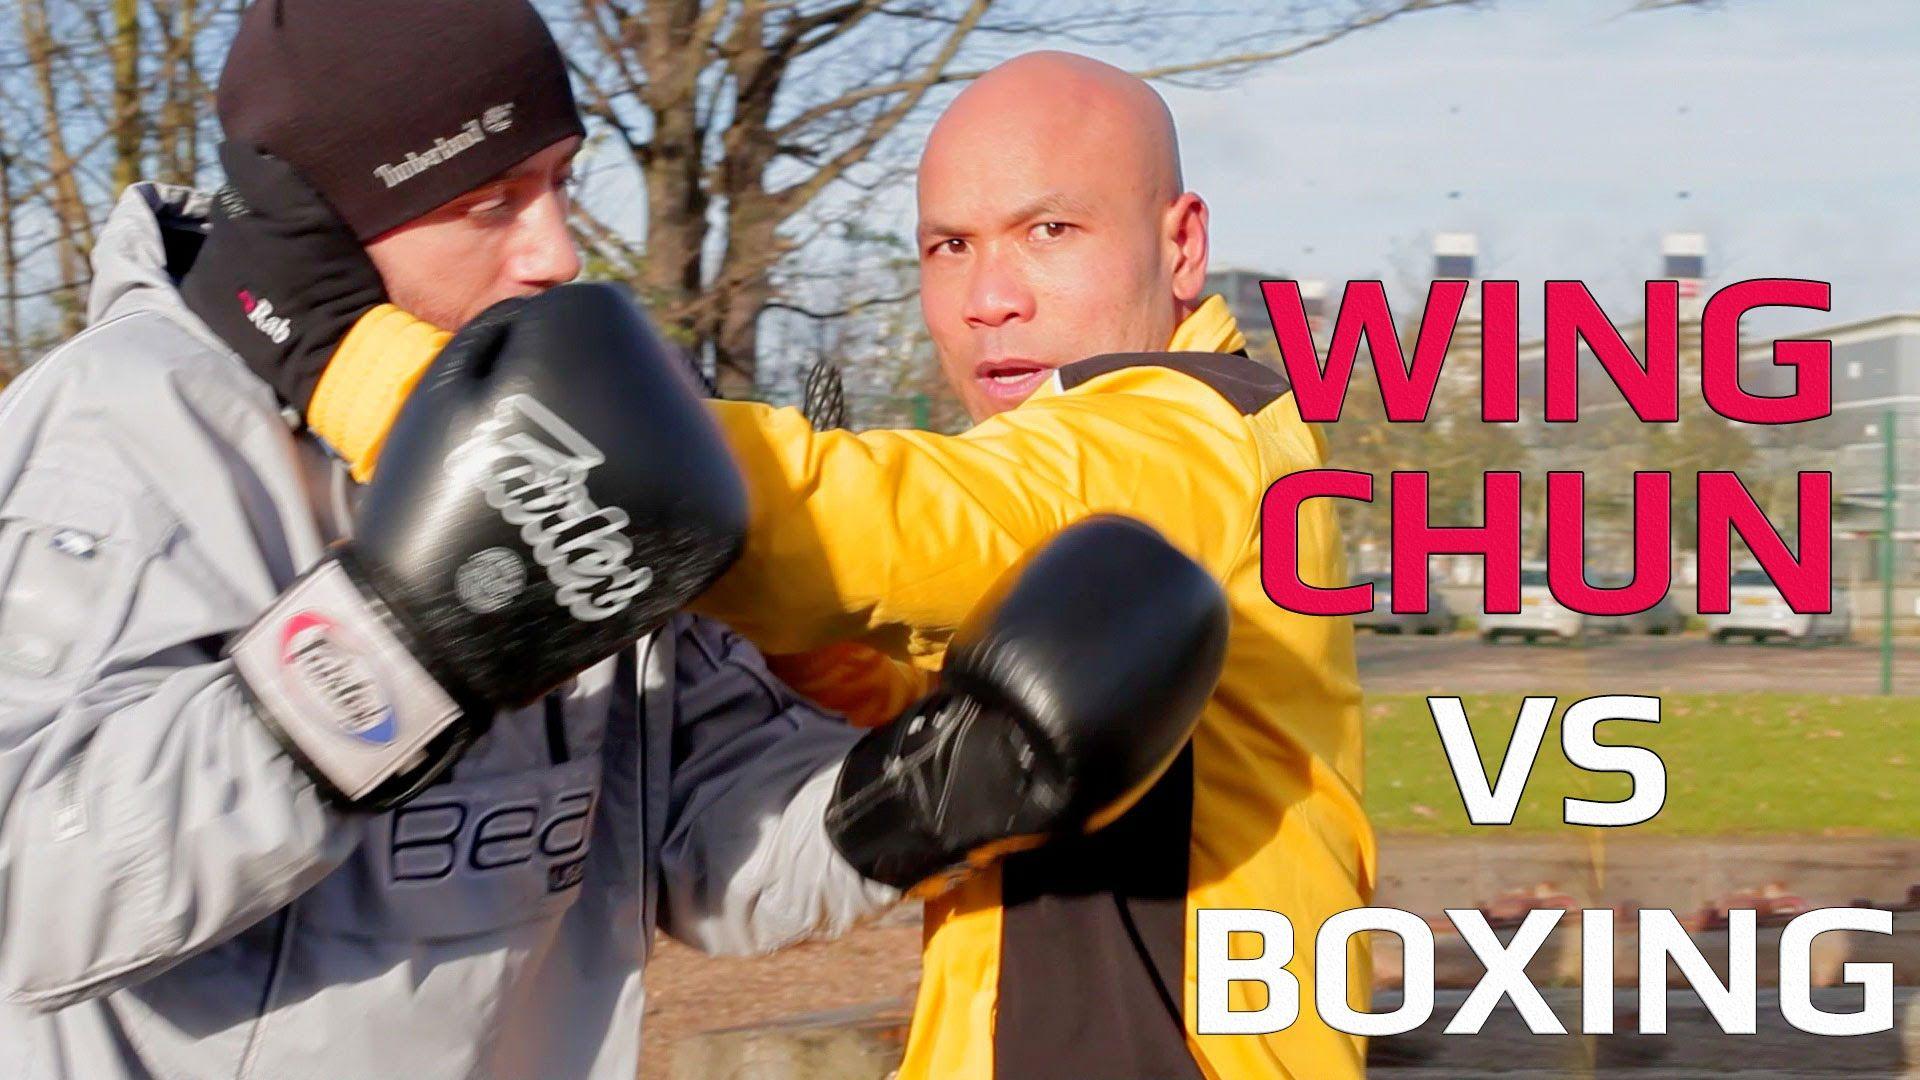 Are boxers dangerous?